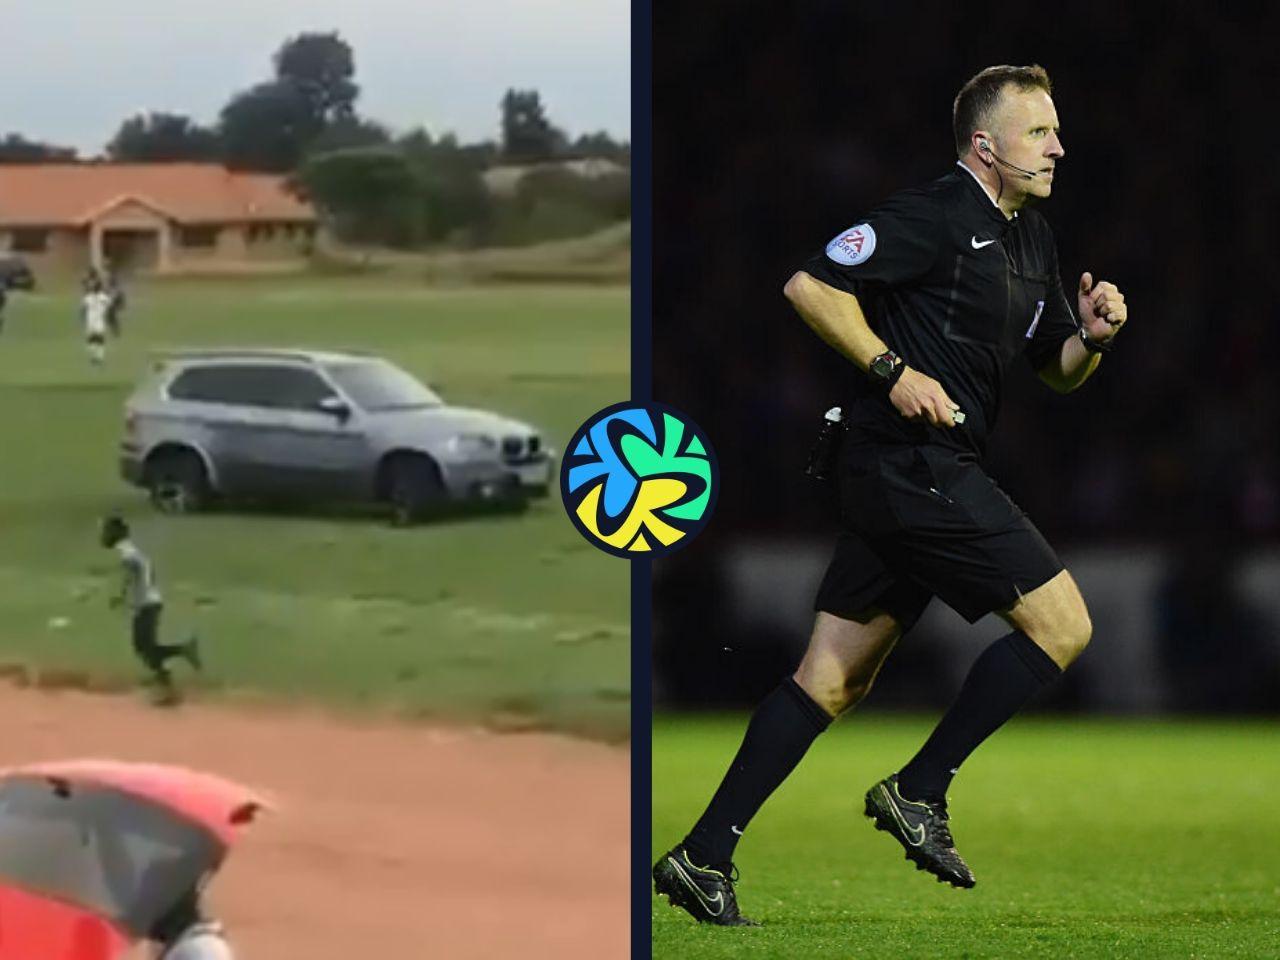 referee car attack